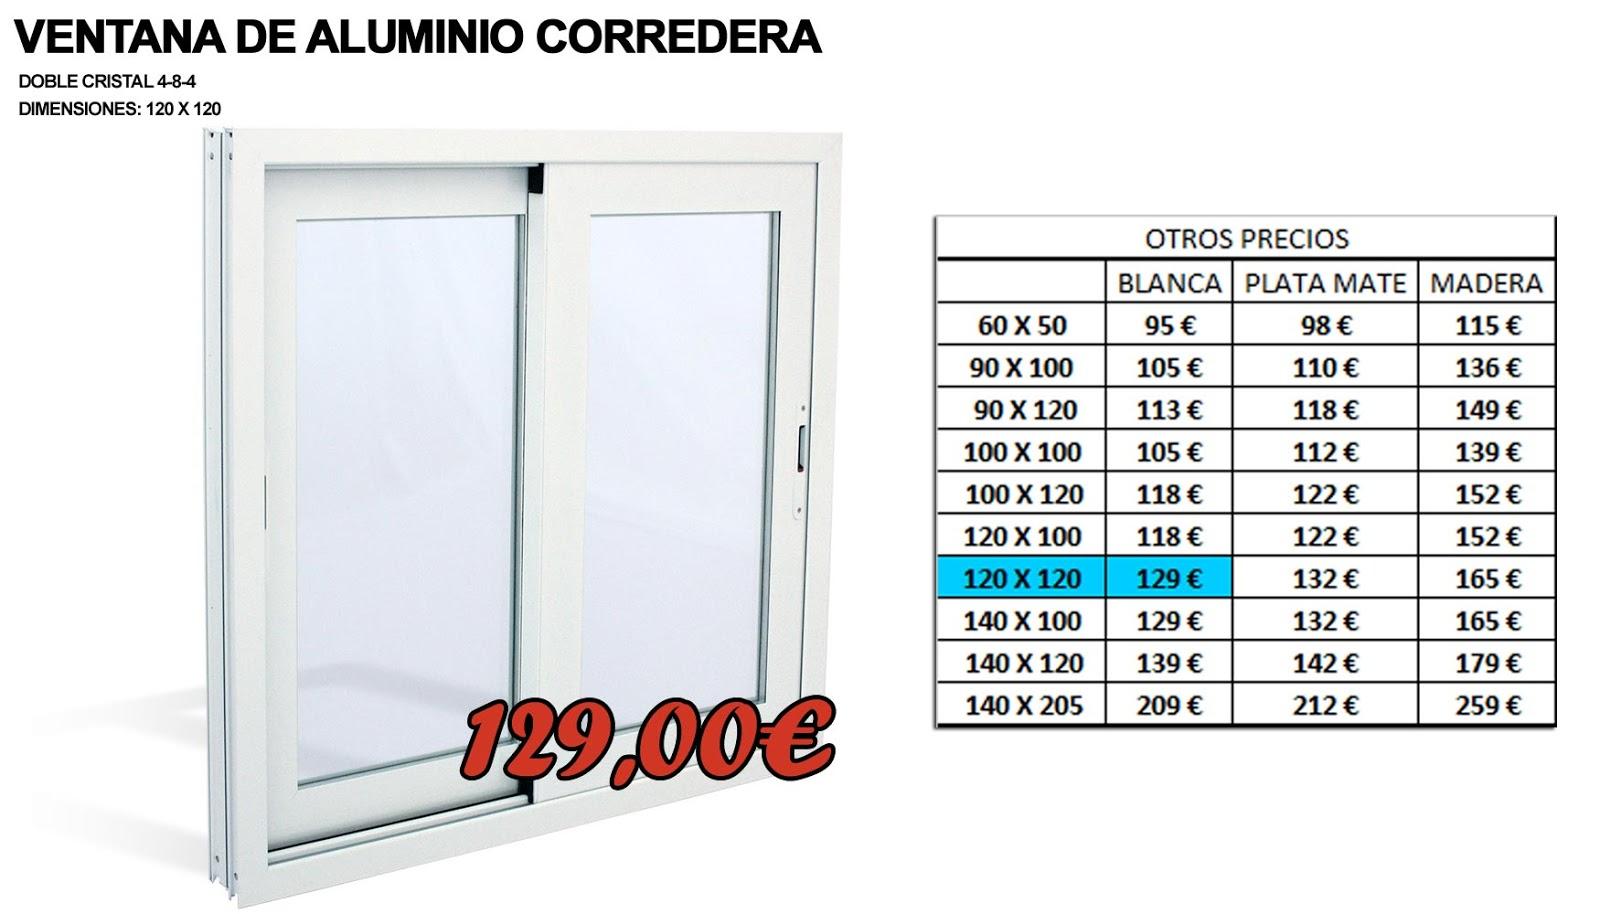 Precio ventanas de pvc top fabricantes de ventanas de pvc - Ventanas de aluminio o pvc precios ...